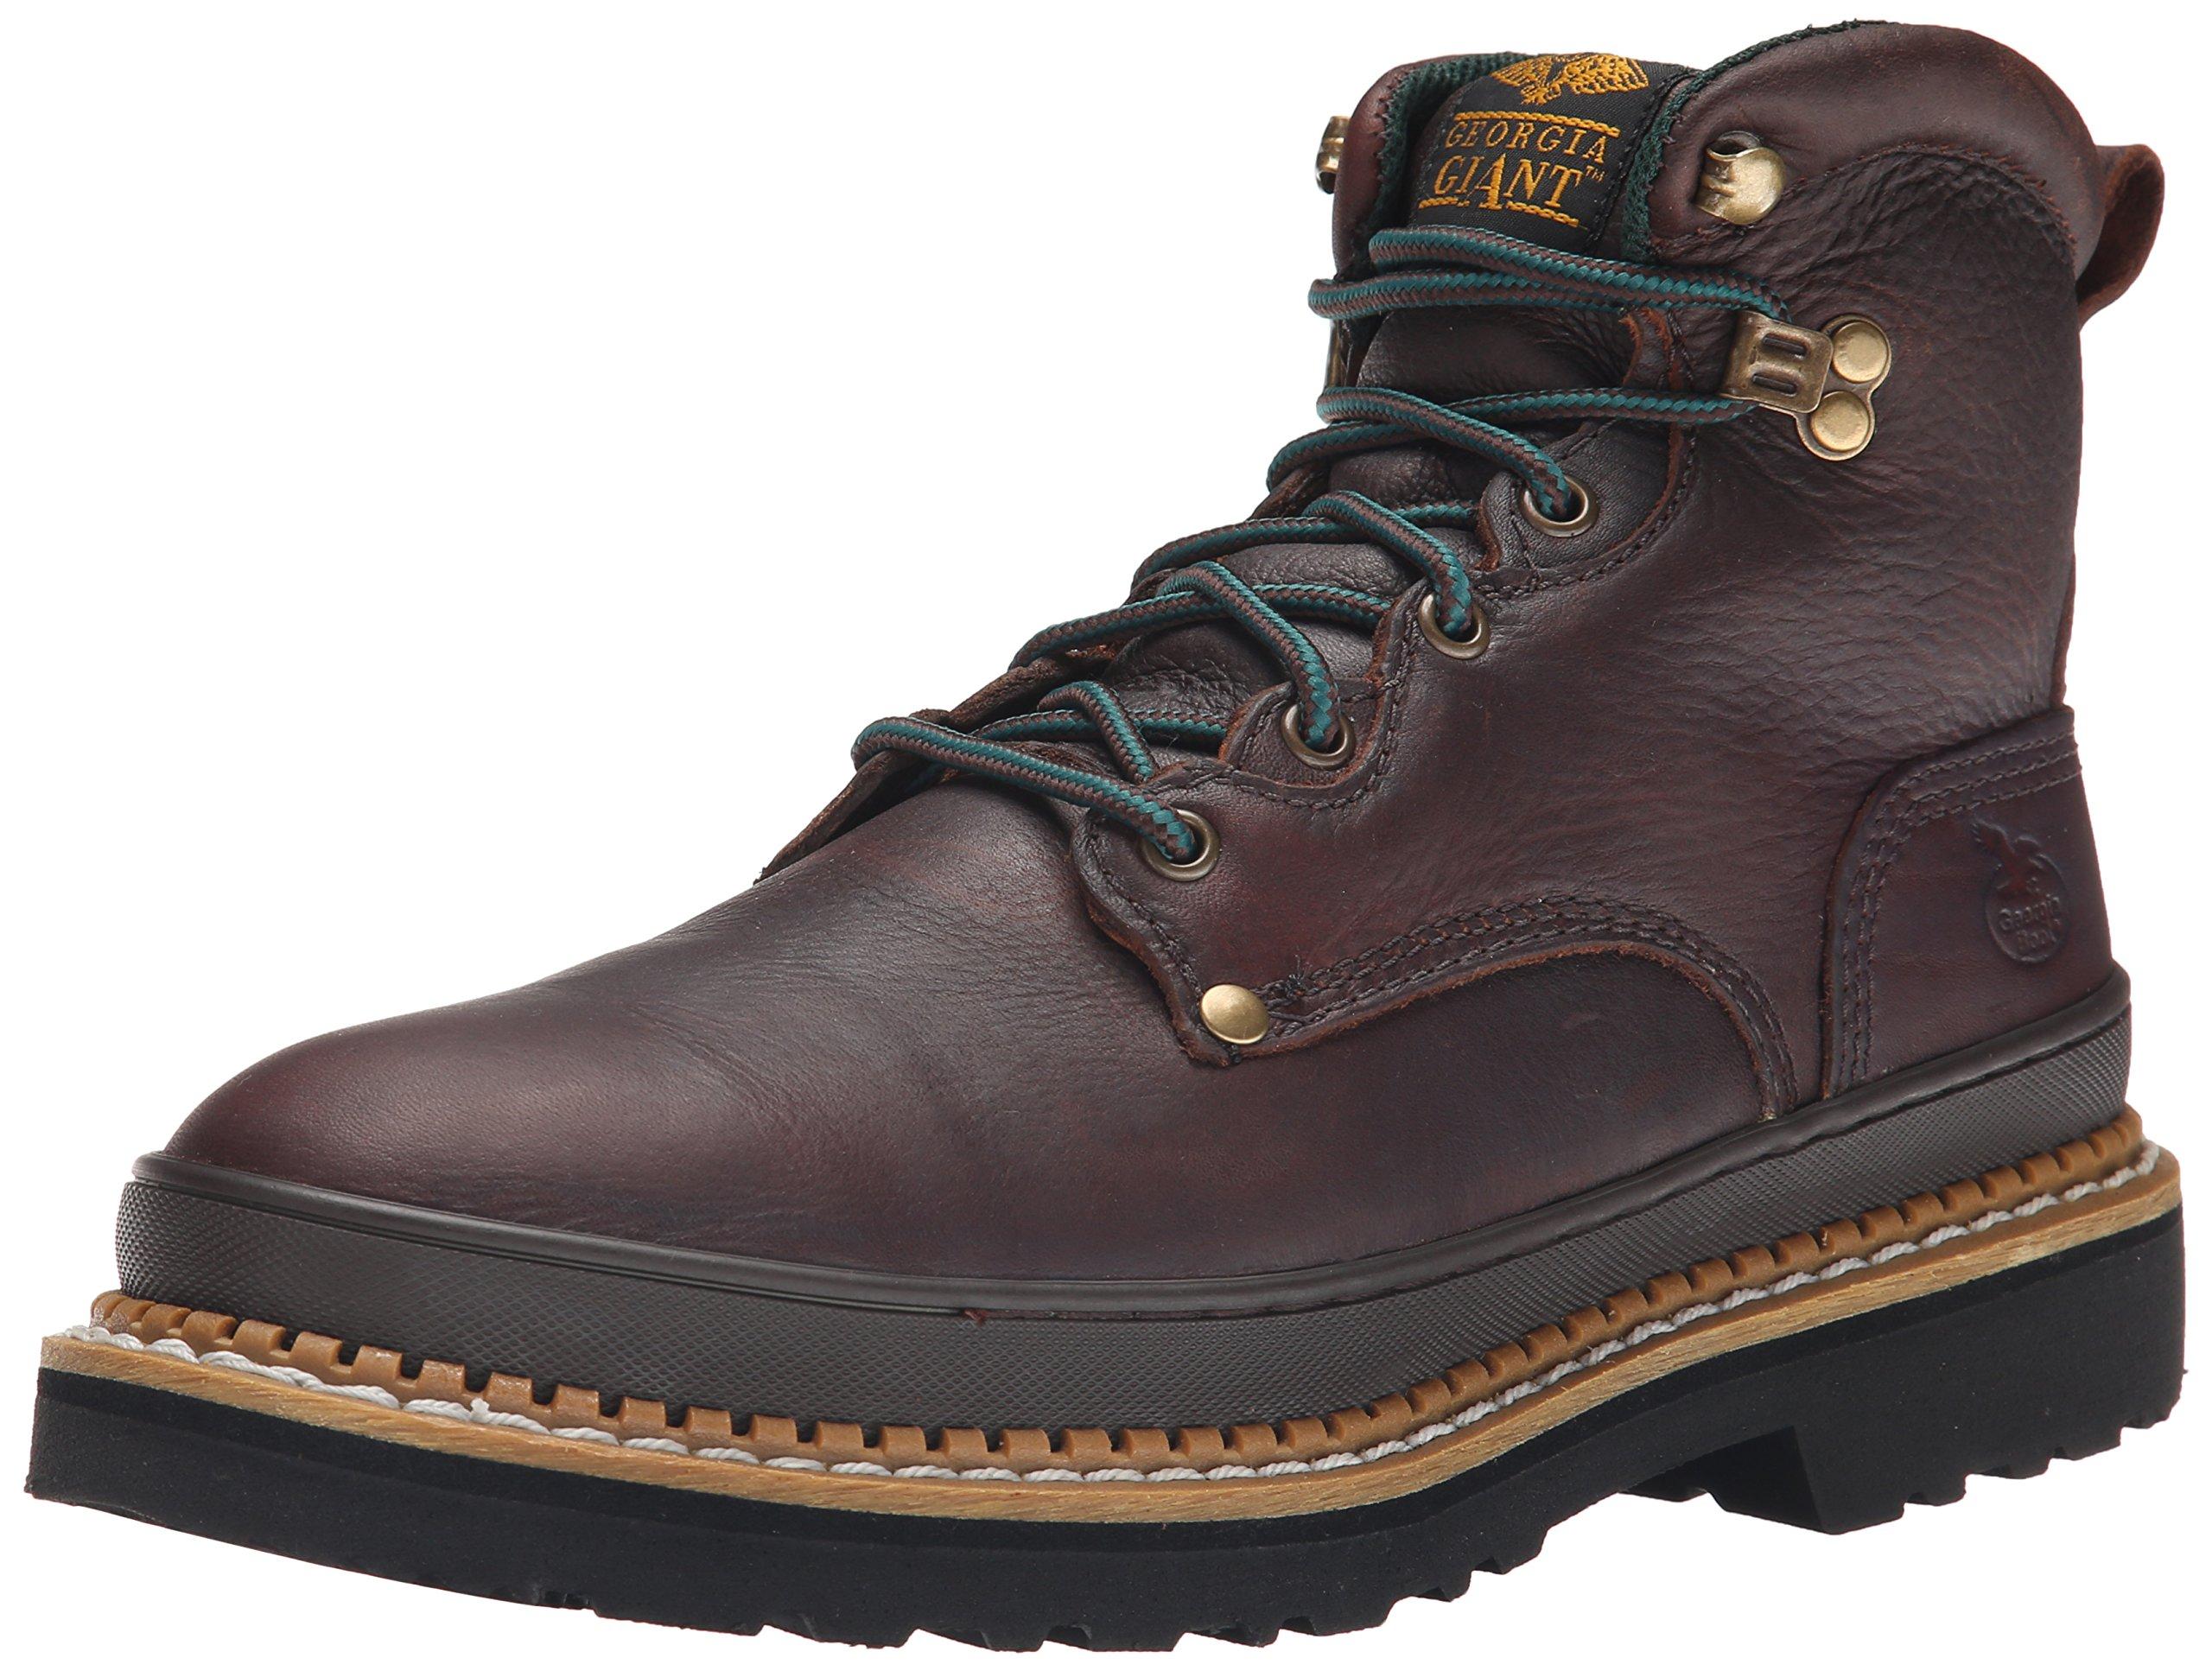 Georgia Boot Men's Giant G6374 Work Boot,Brown,10.5 W